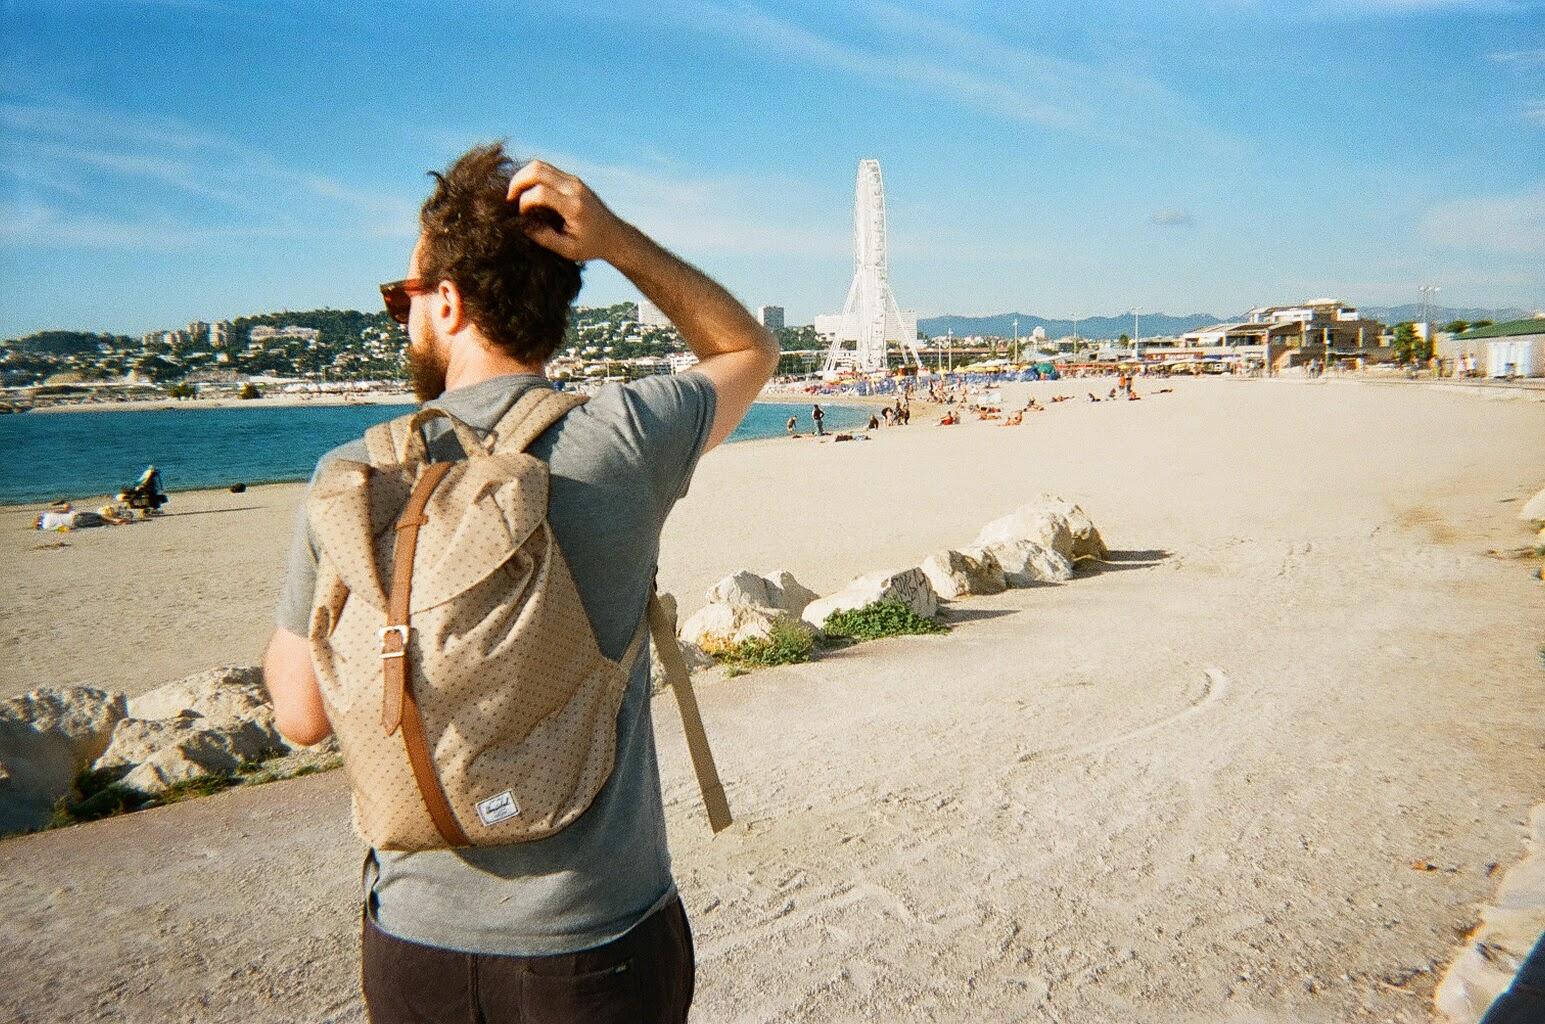 Lookbook - California to Marseille